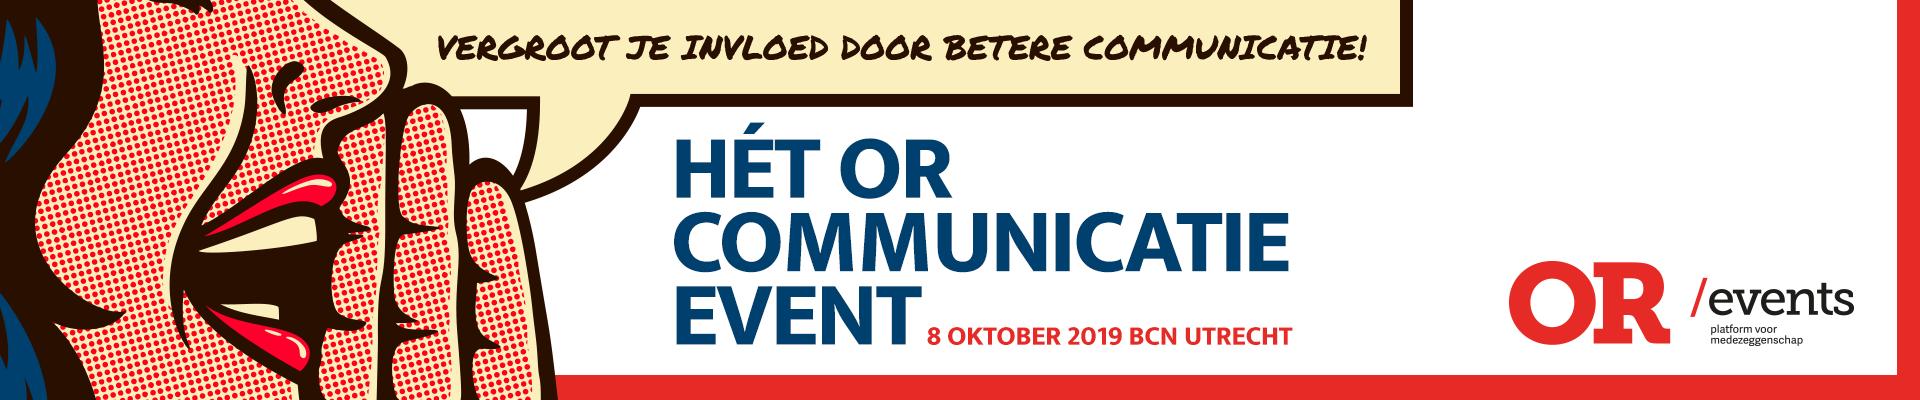 Hét OR communicatie event